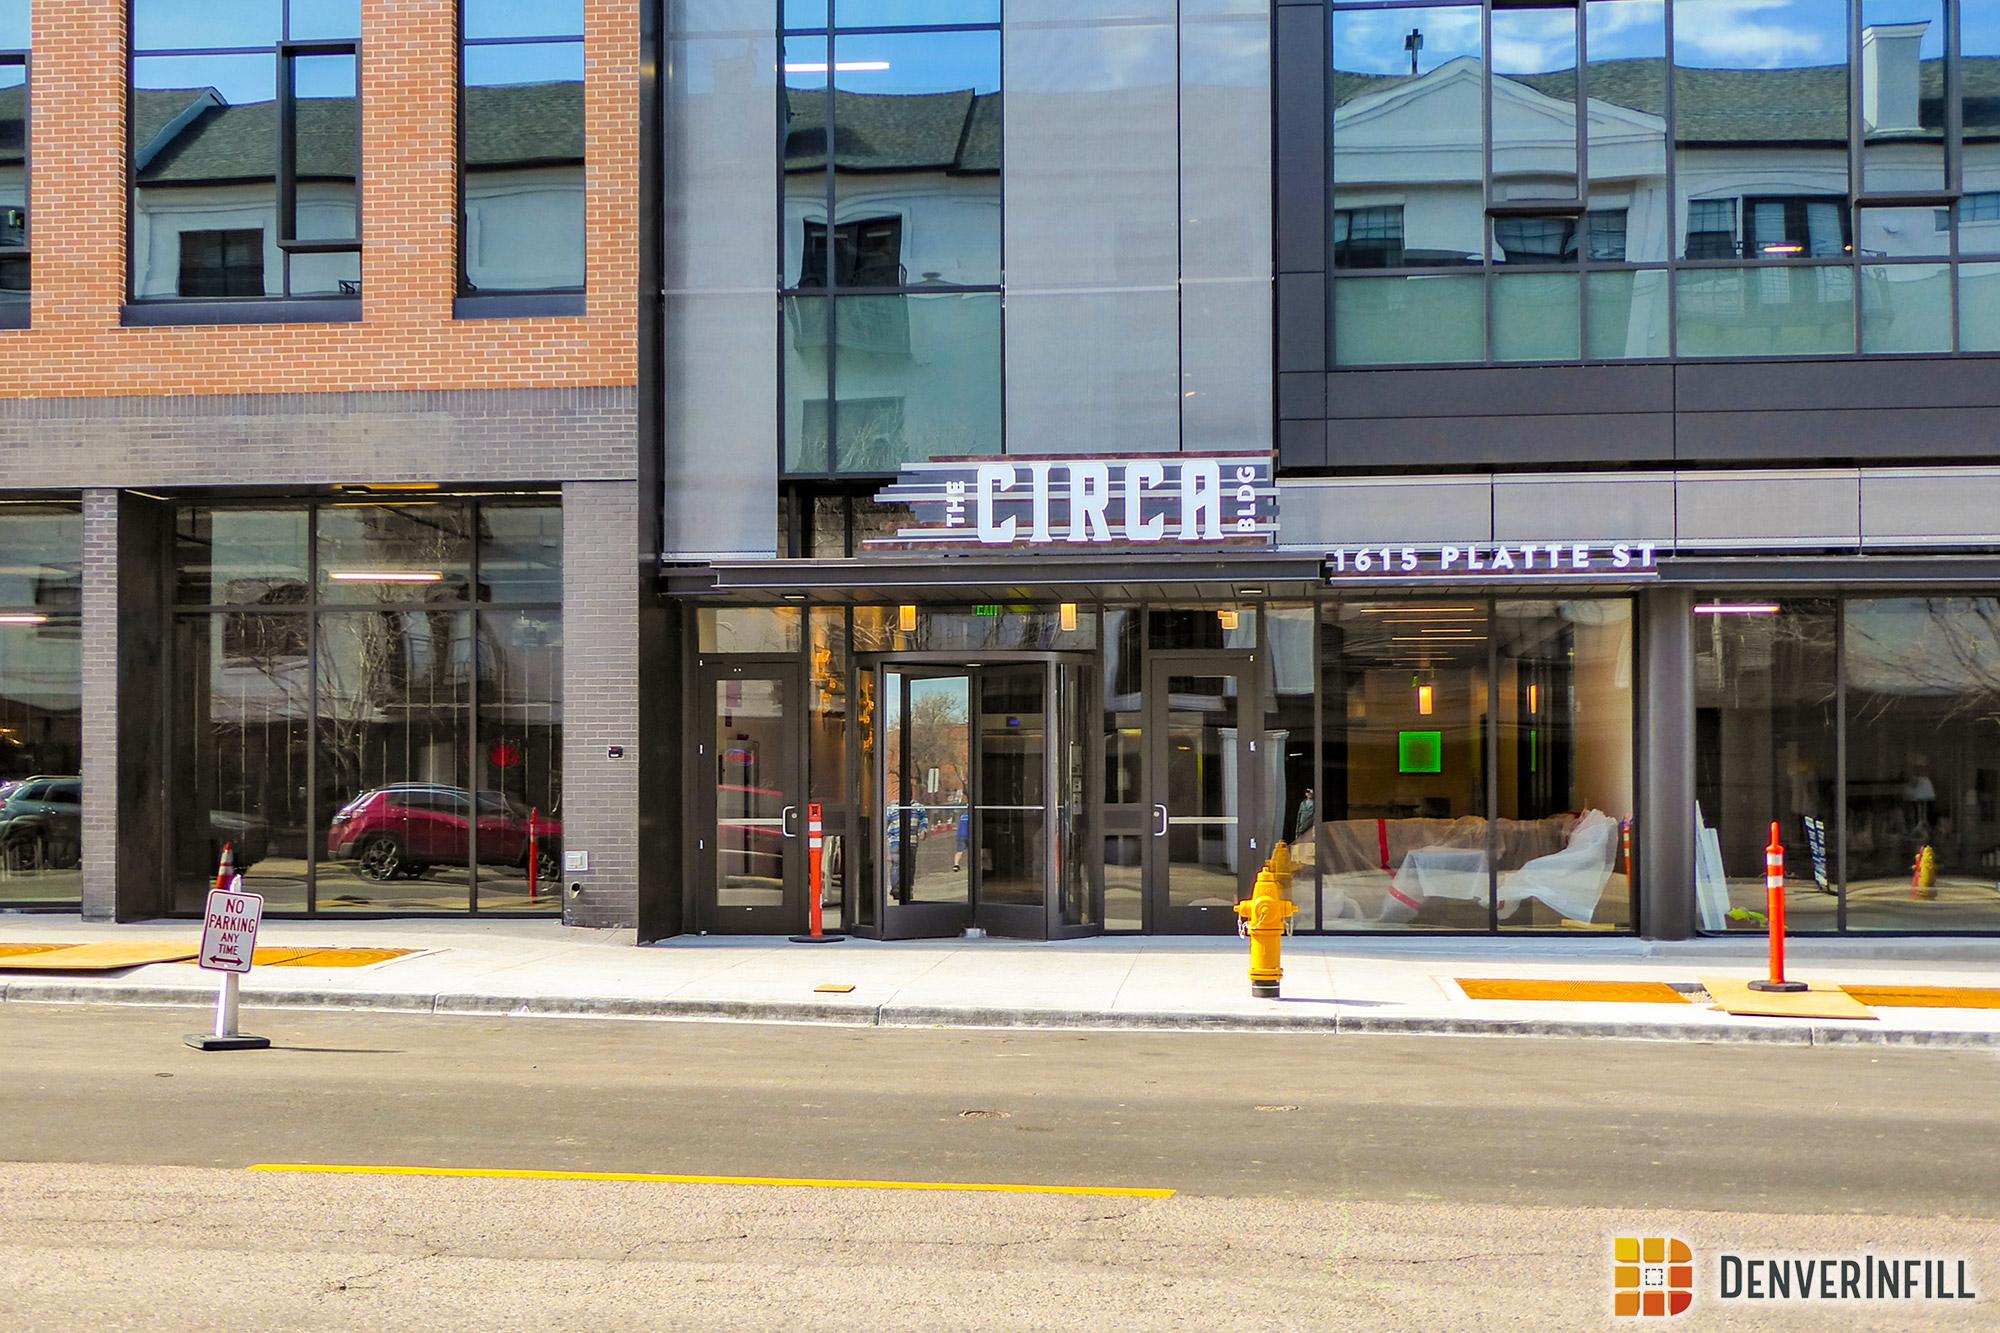 The Circa Building main entry along Platte Street